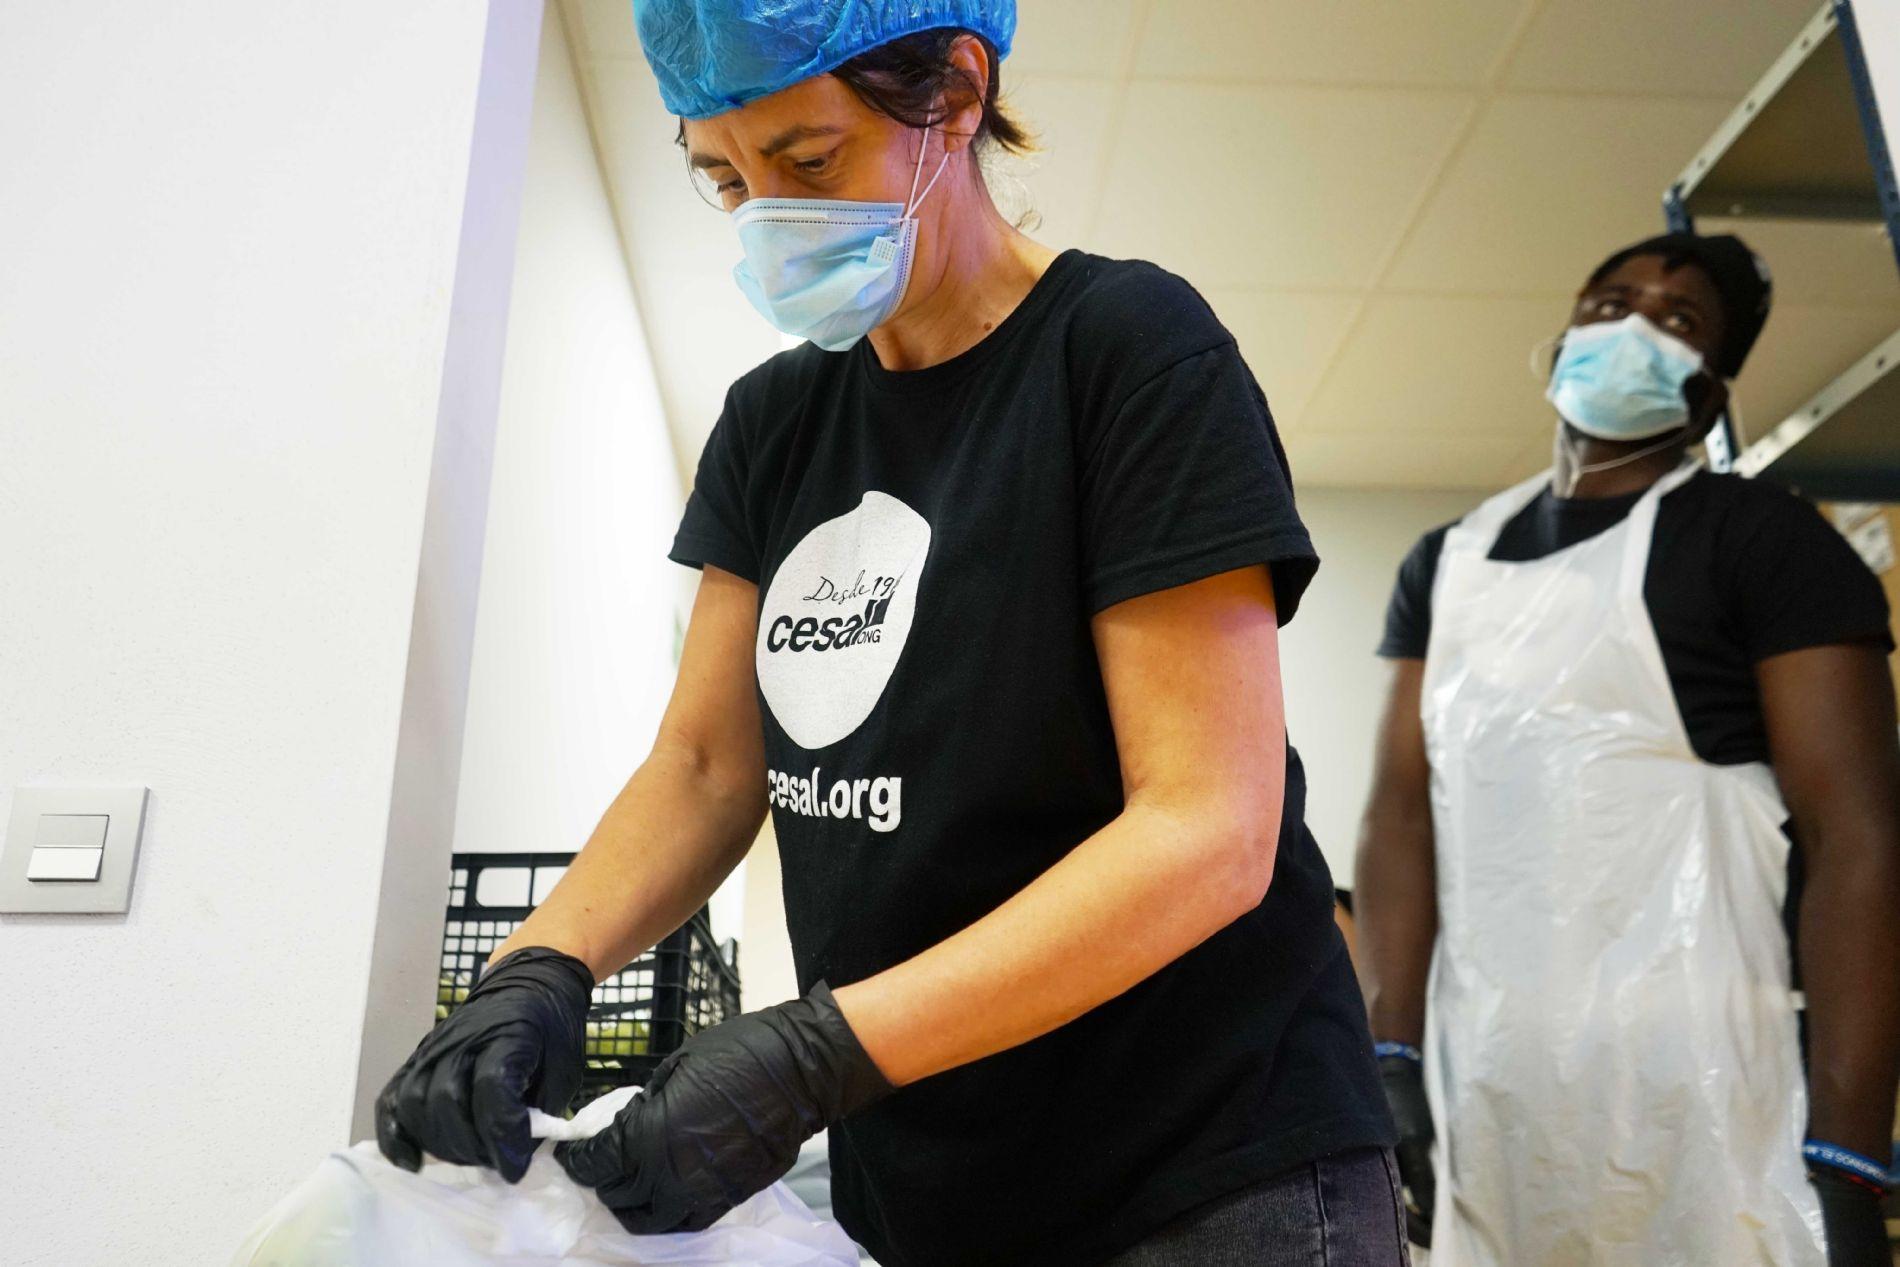 coronavirus; emergencia; salud; CESAL; dona; voluntariado Gastrolab Villaverde Madrid